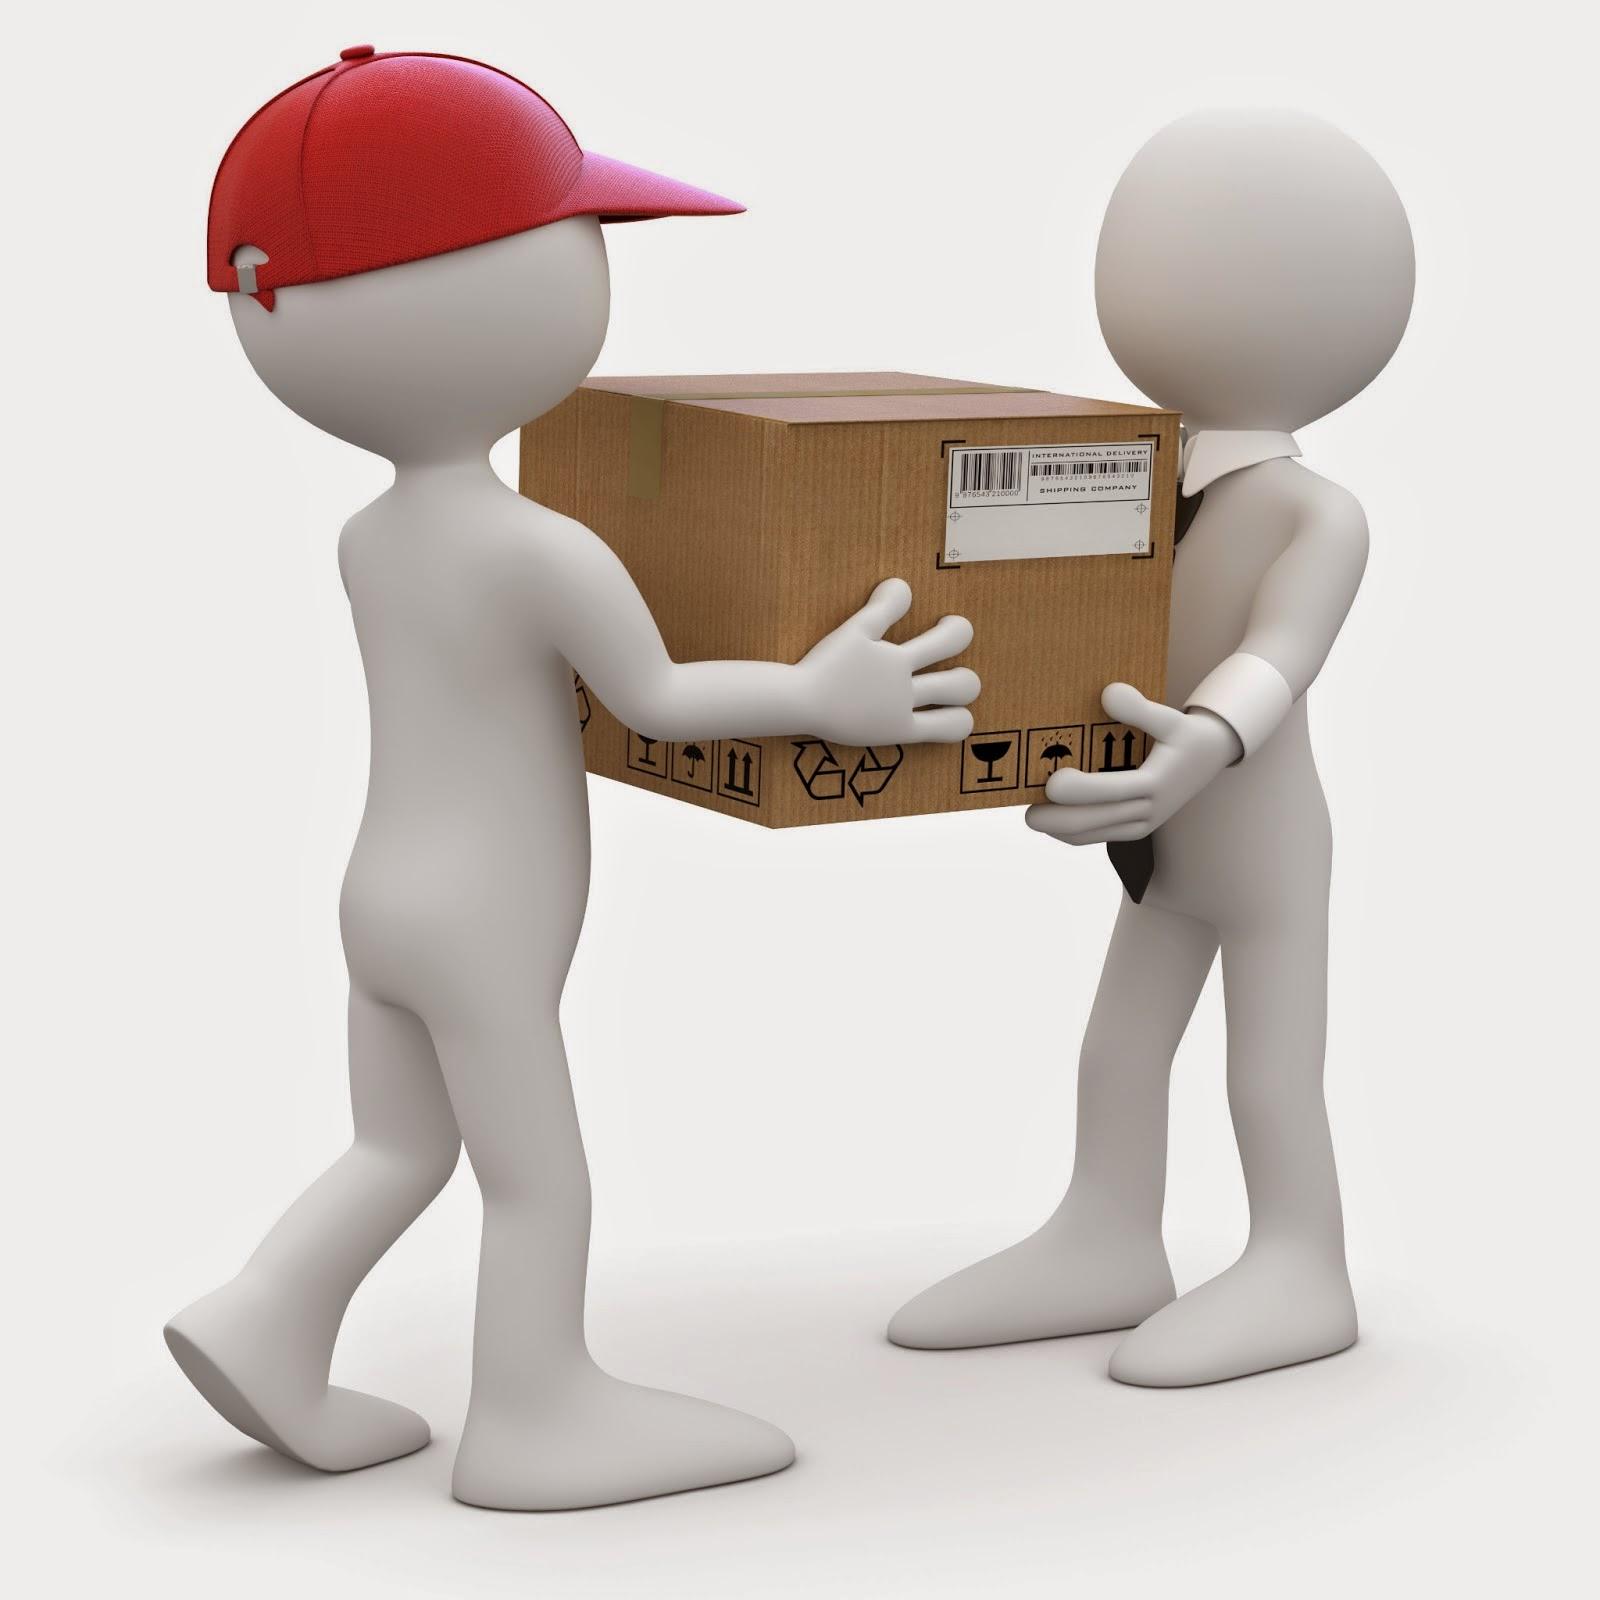 onlineshop, delivery, cara pesan, kurir animasi, shipping